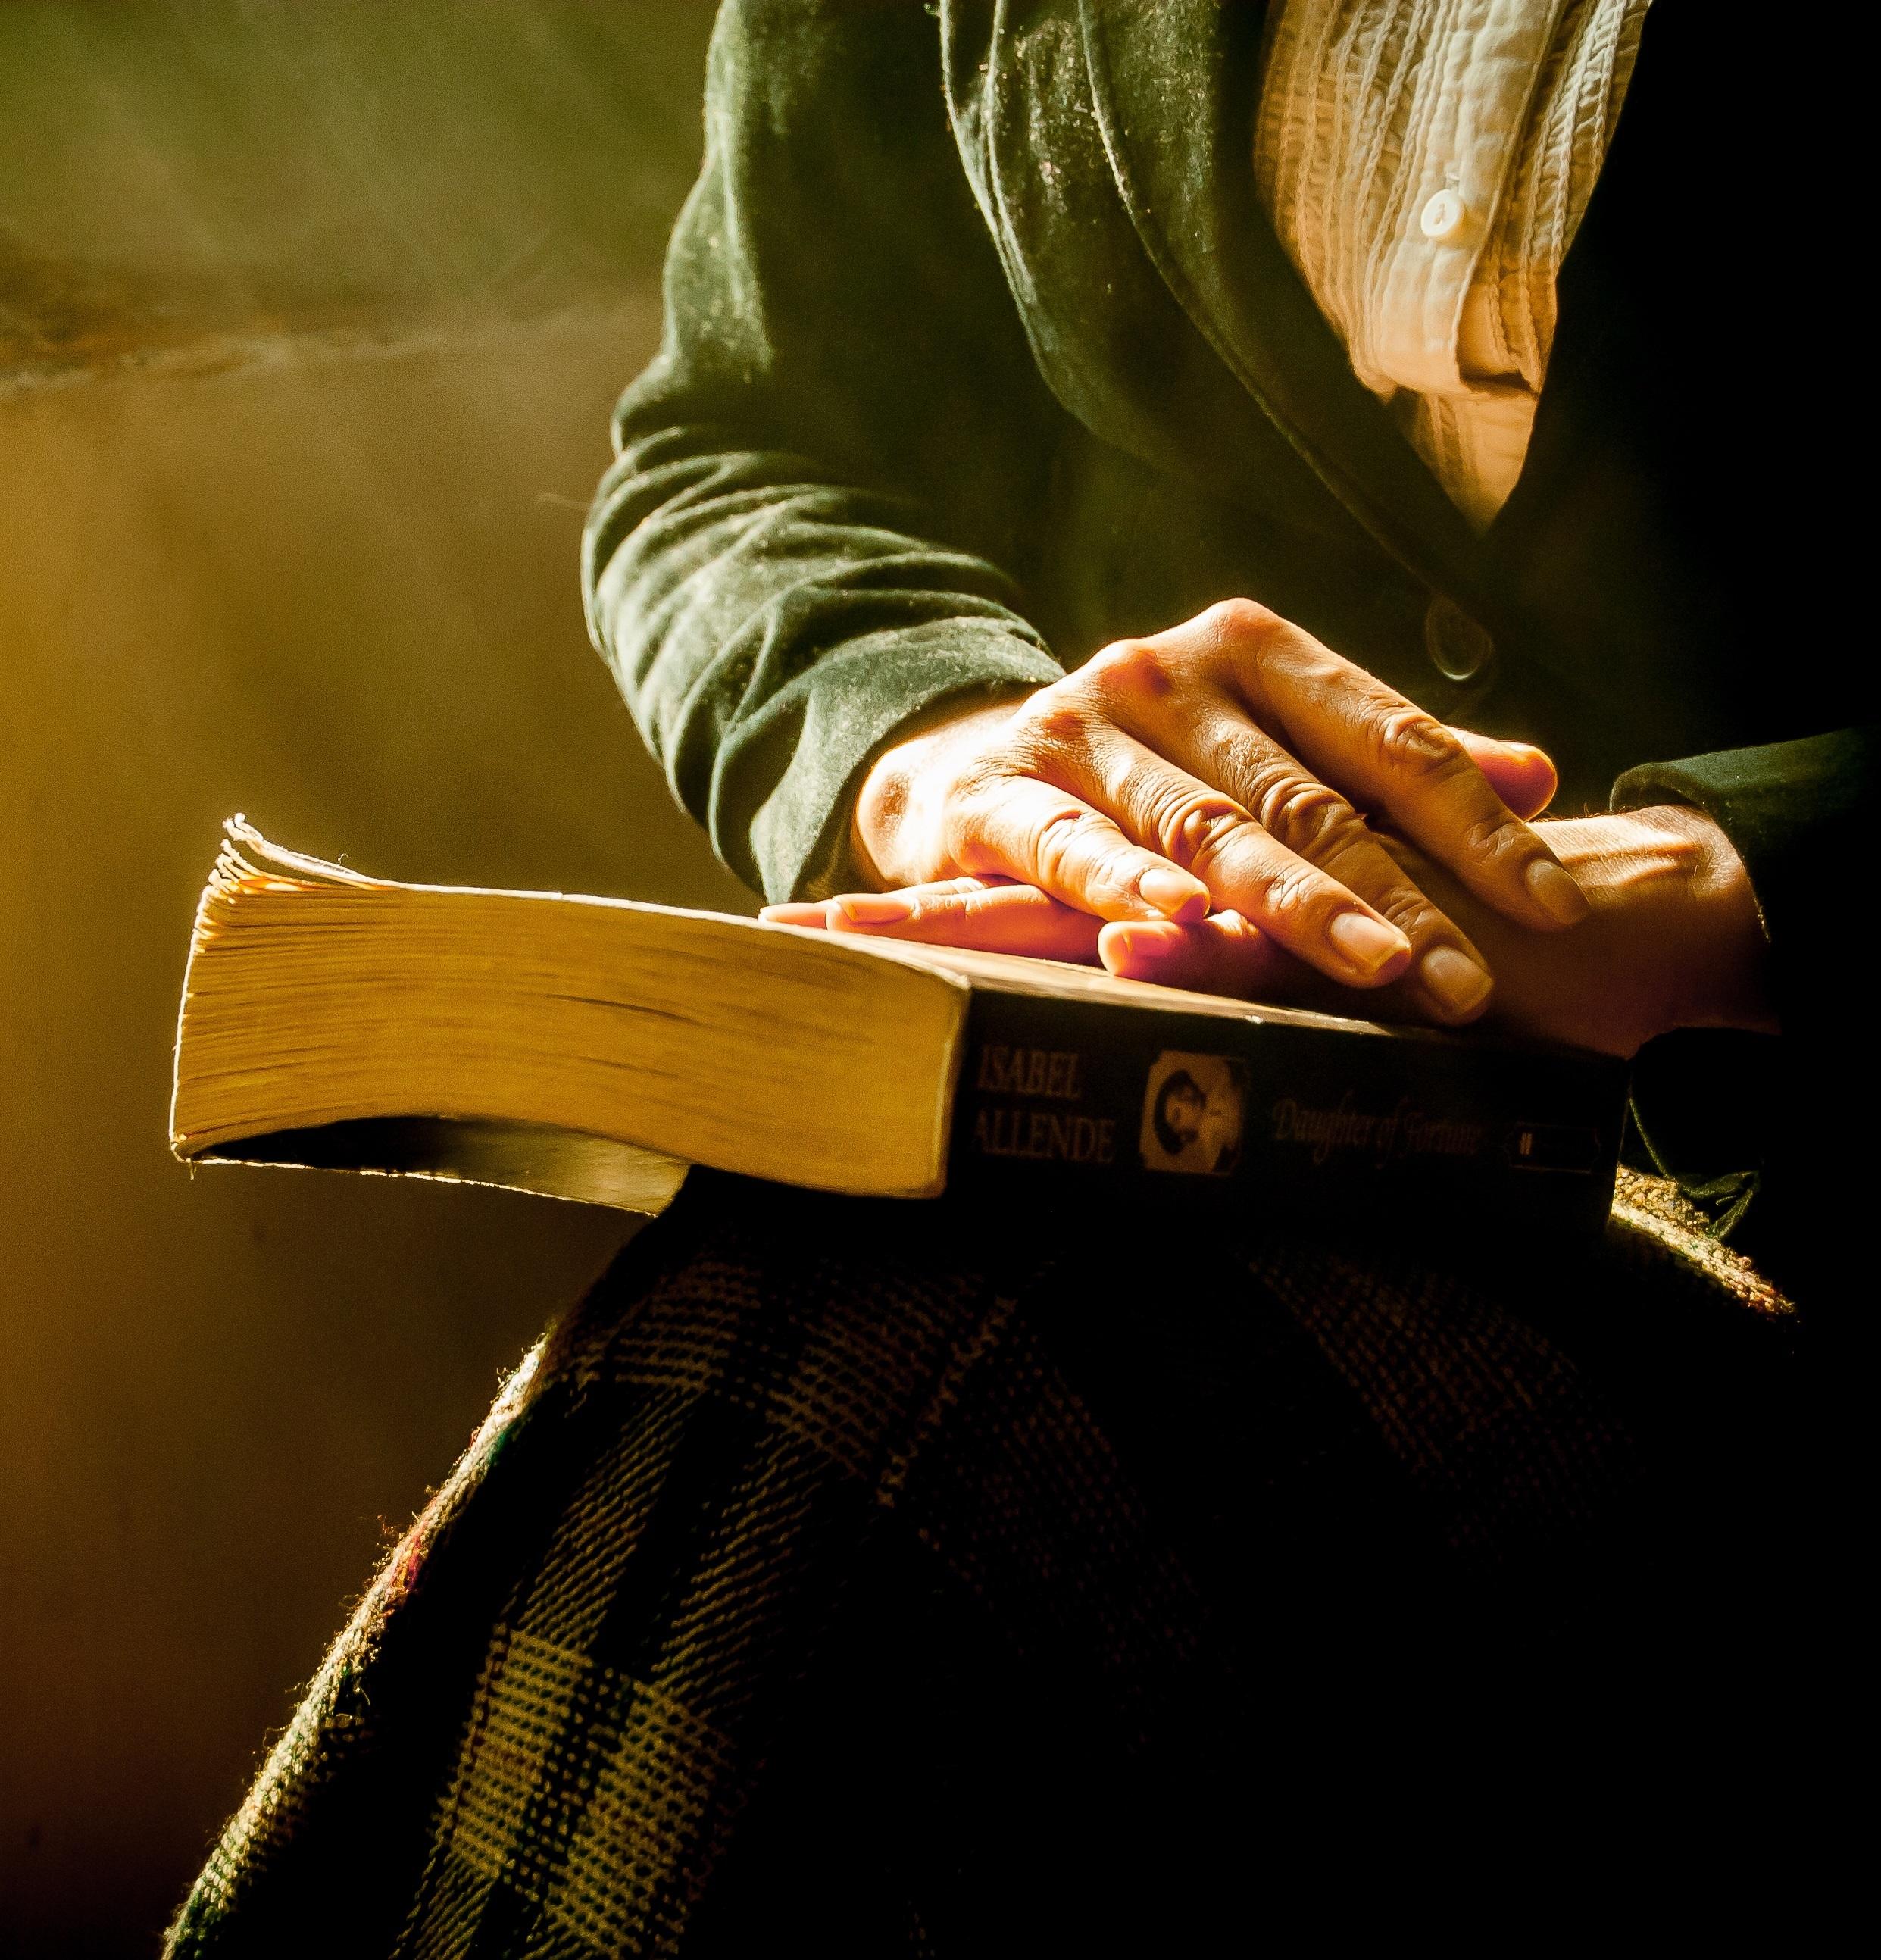 book-1421097-crop